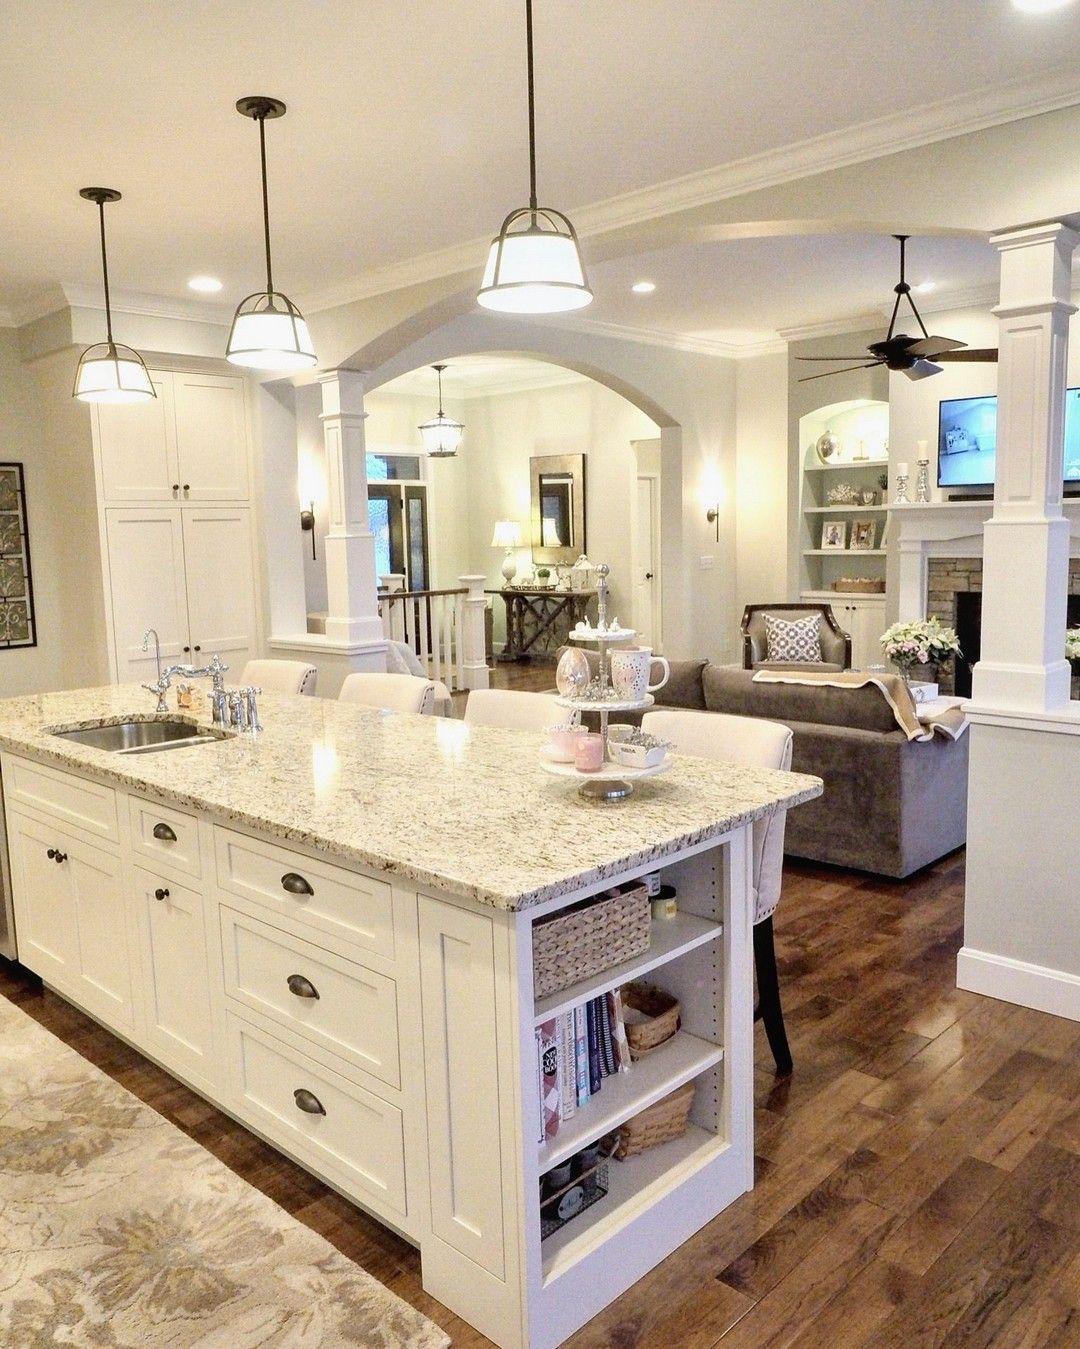 Dreamy White Kitchen Cabinets Design Ideas